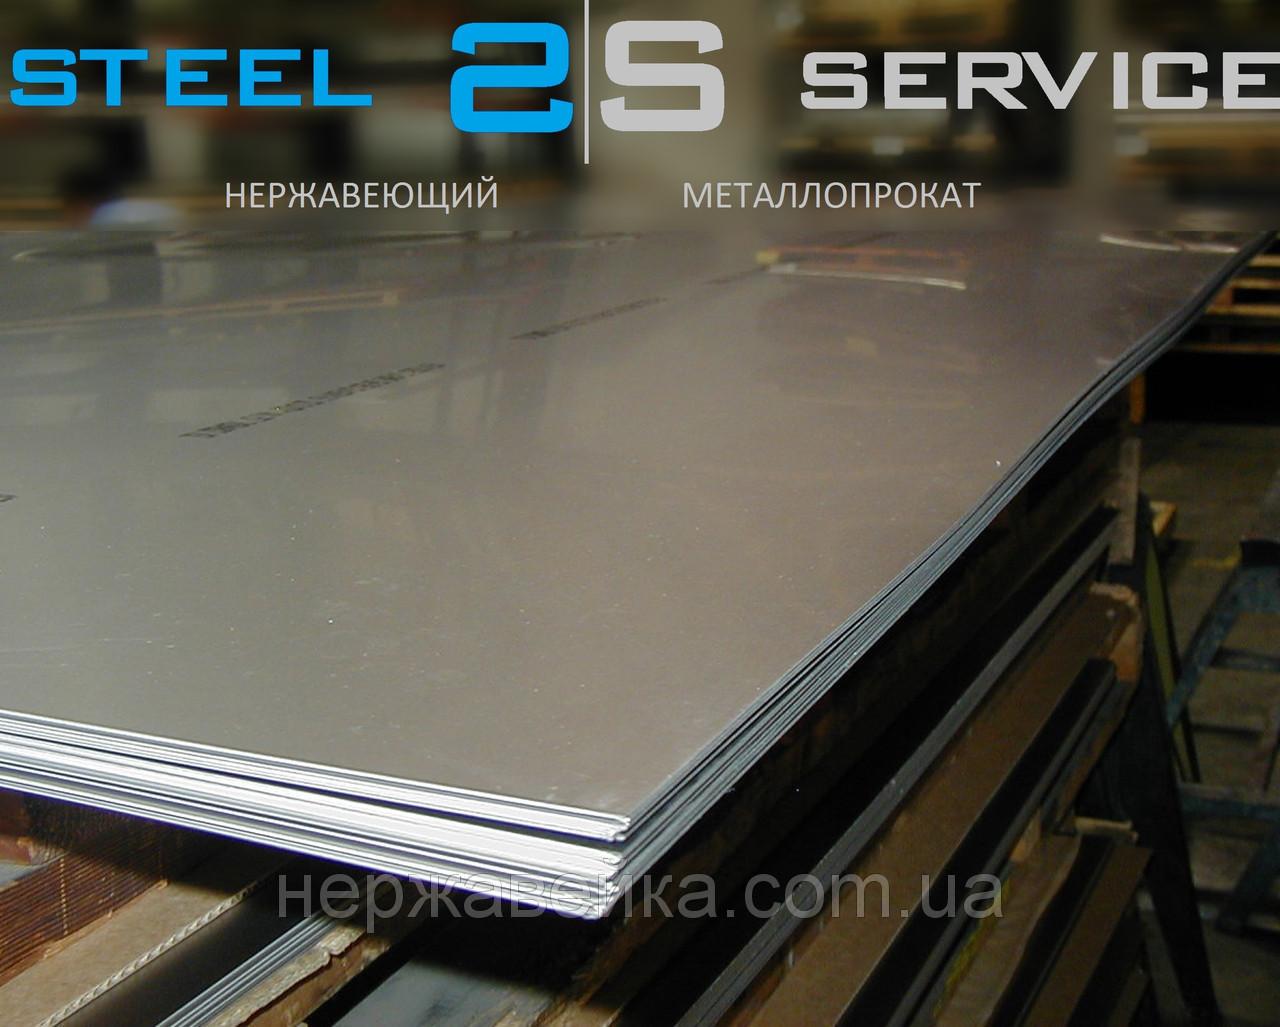 Нержавеющий лист 20х1000х2000мм AISI 316L(03Х17Н14М3) F1 - горячекатанный,  кислотостойкий